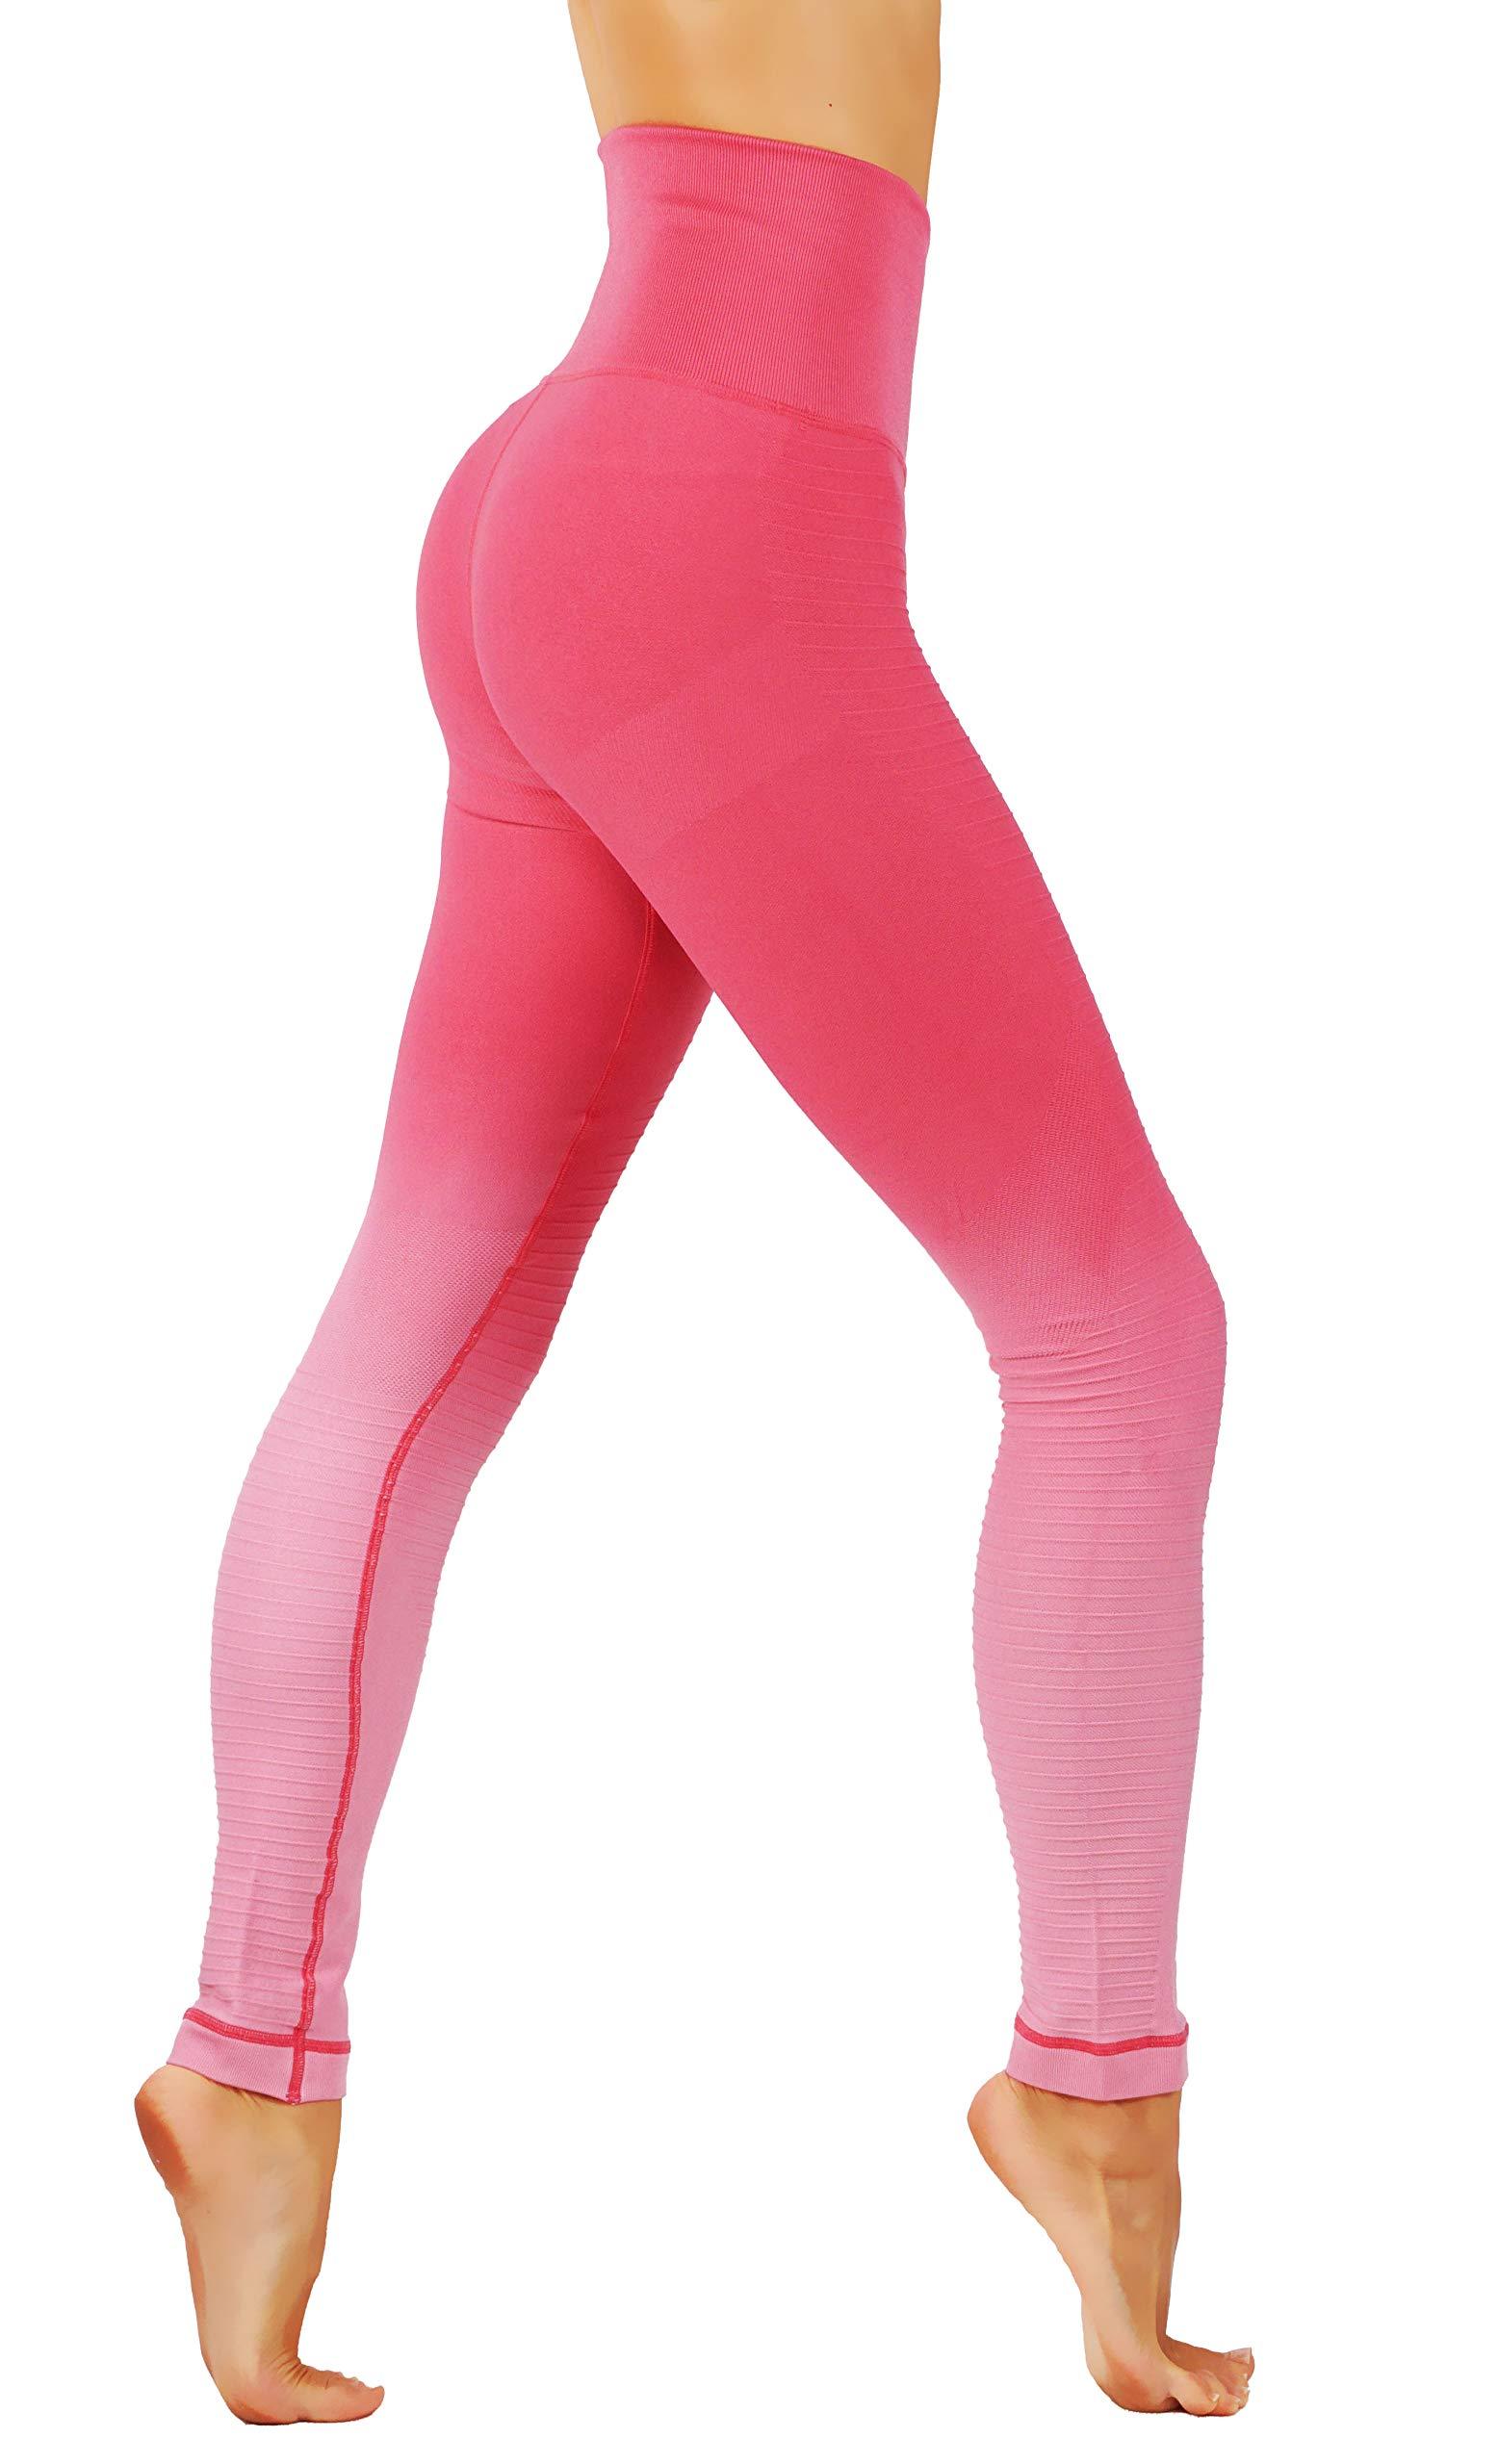 CodeFit Yoga Gym Power Flex Dry-Fit High Compression Pants Workout Women's Leggings (M USA 4-8, CF 702-LPK)